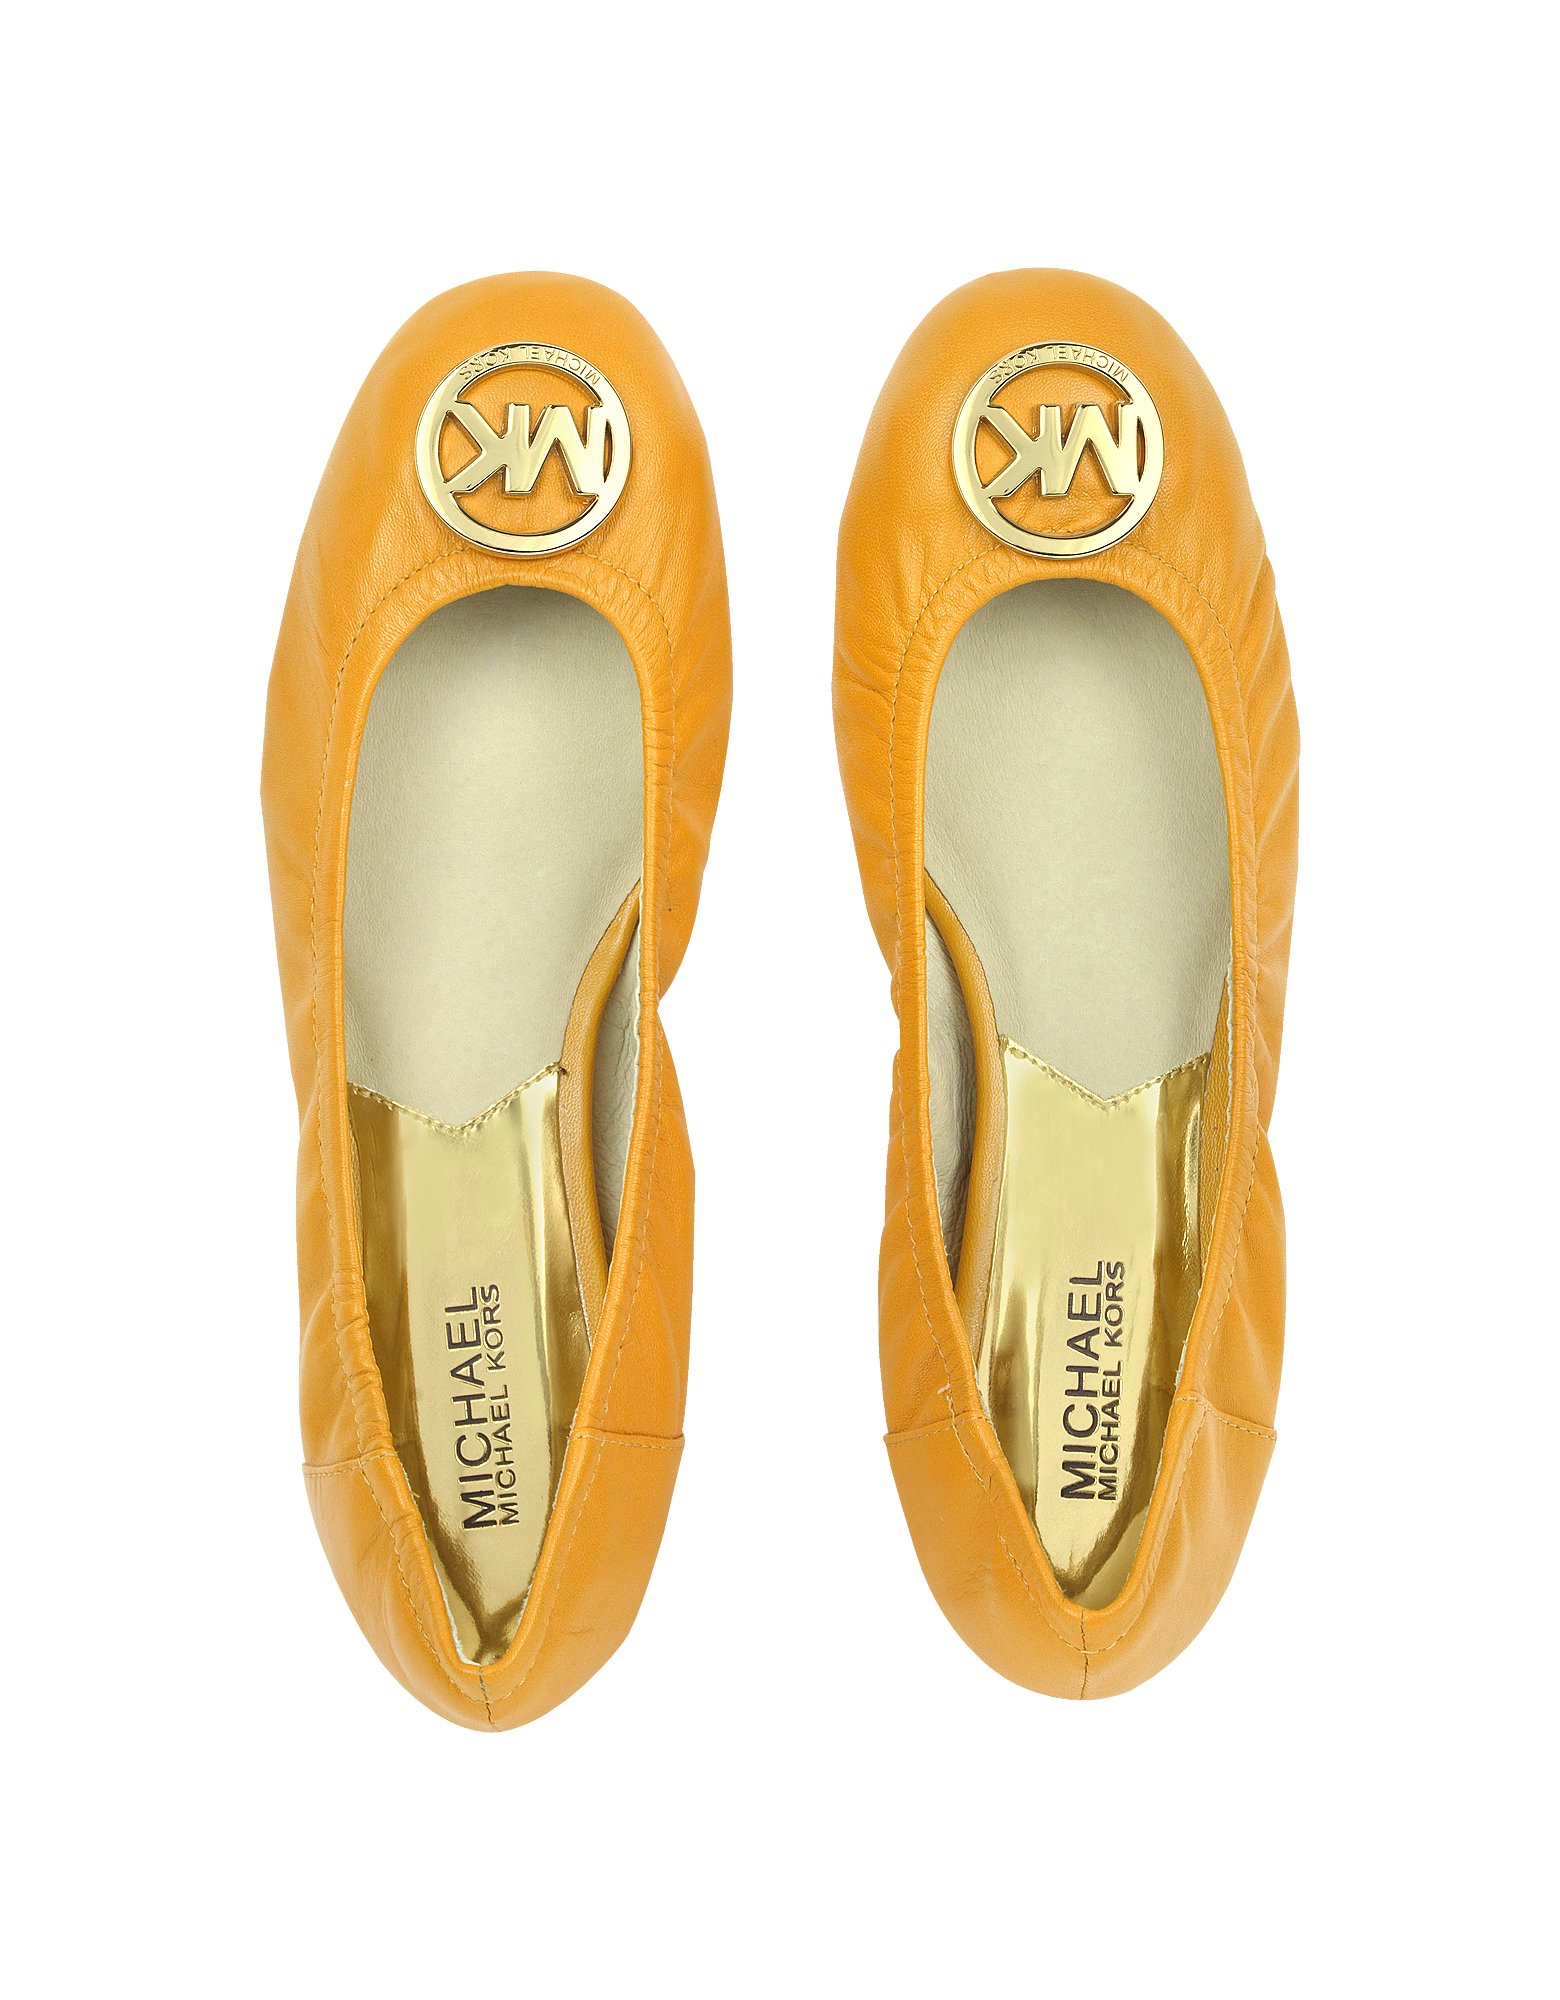 Michael Kors Fulton Ballet Flat Shoes